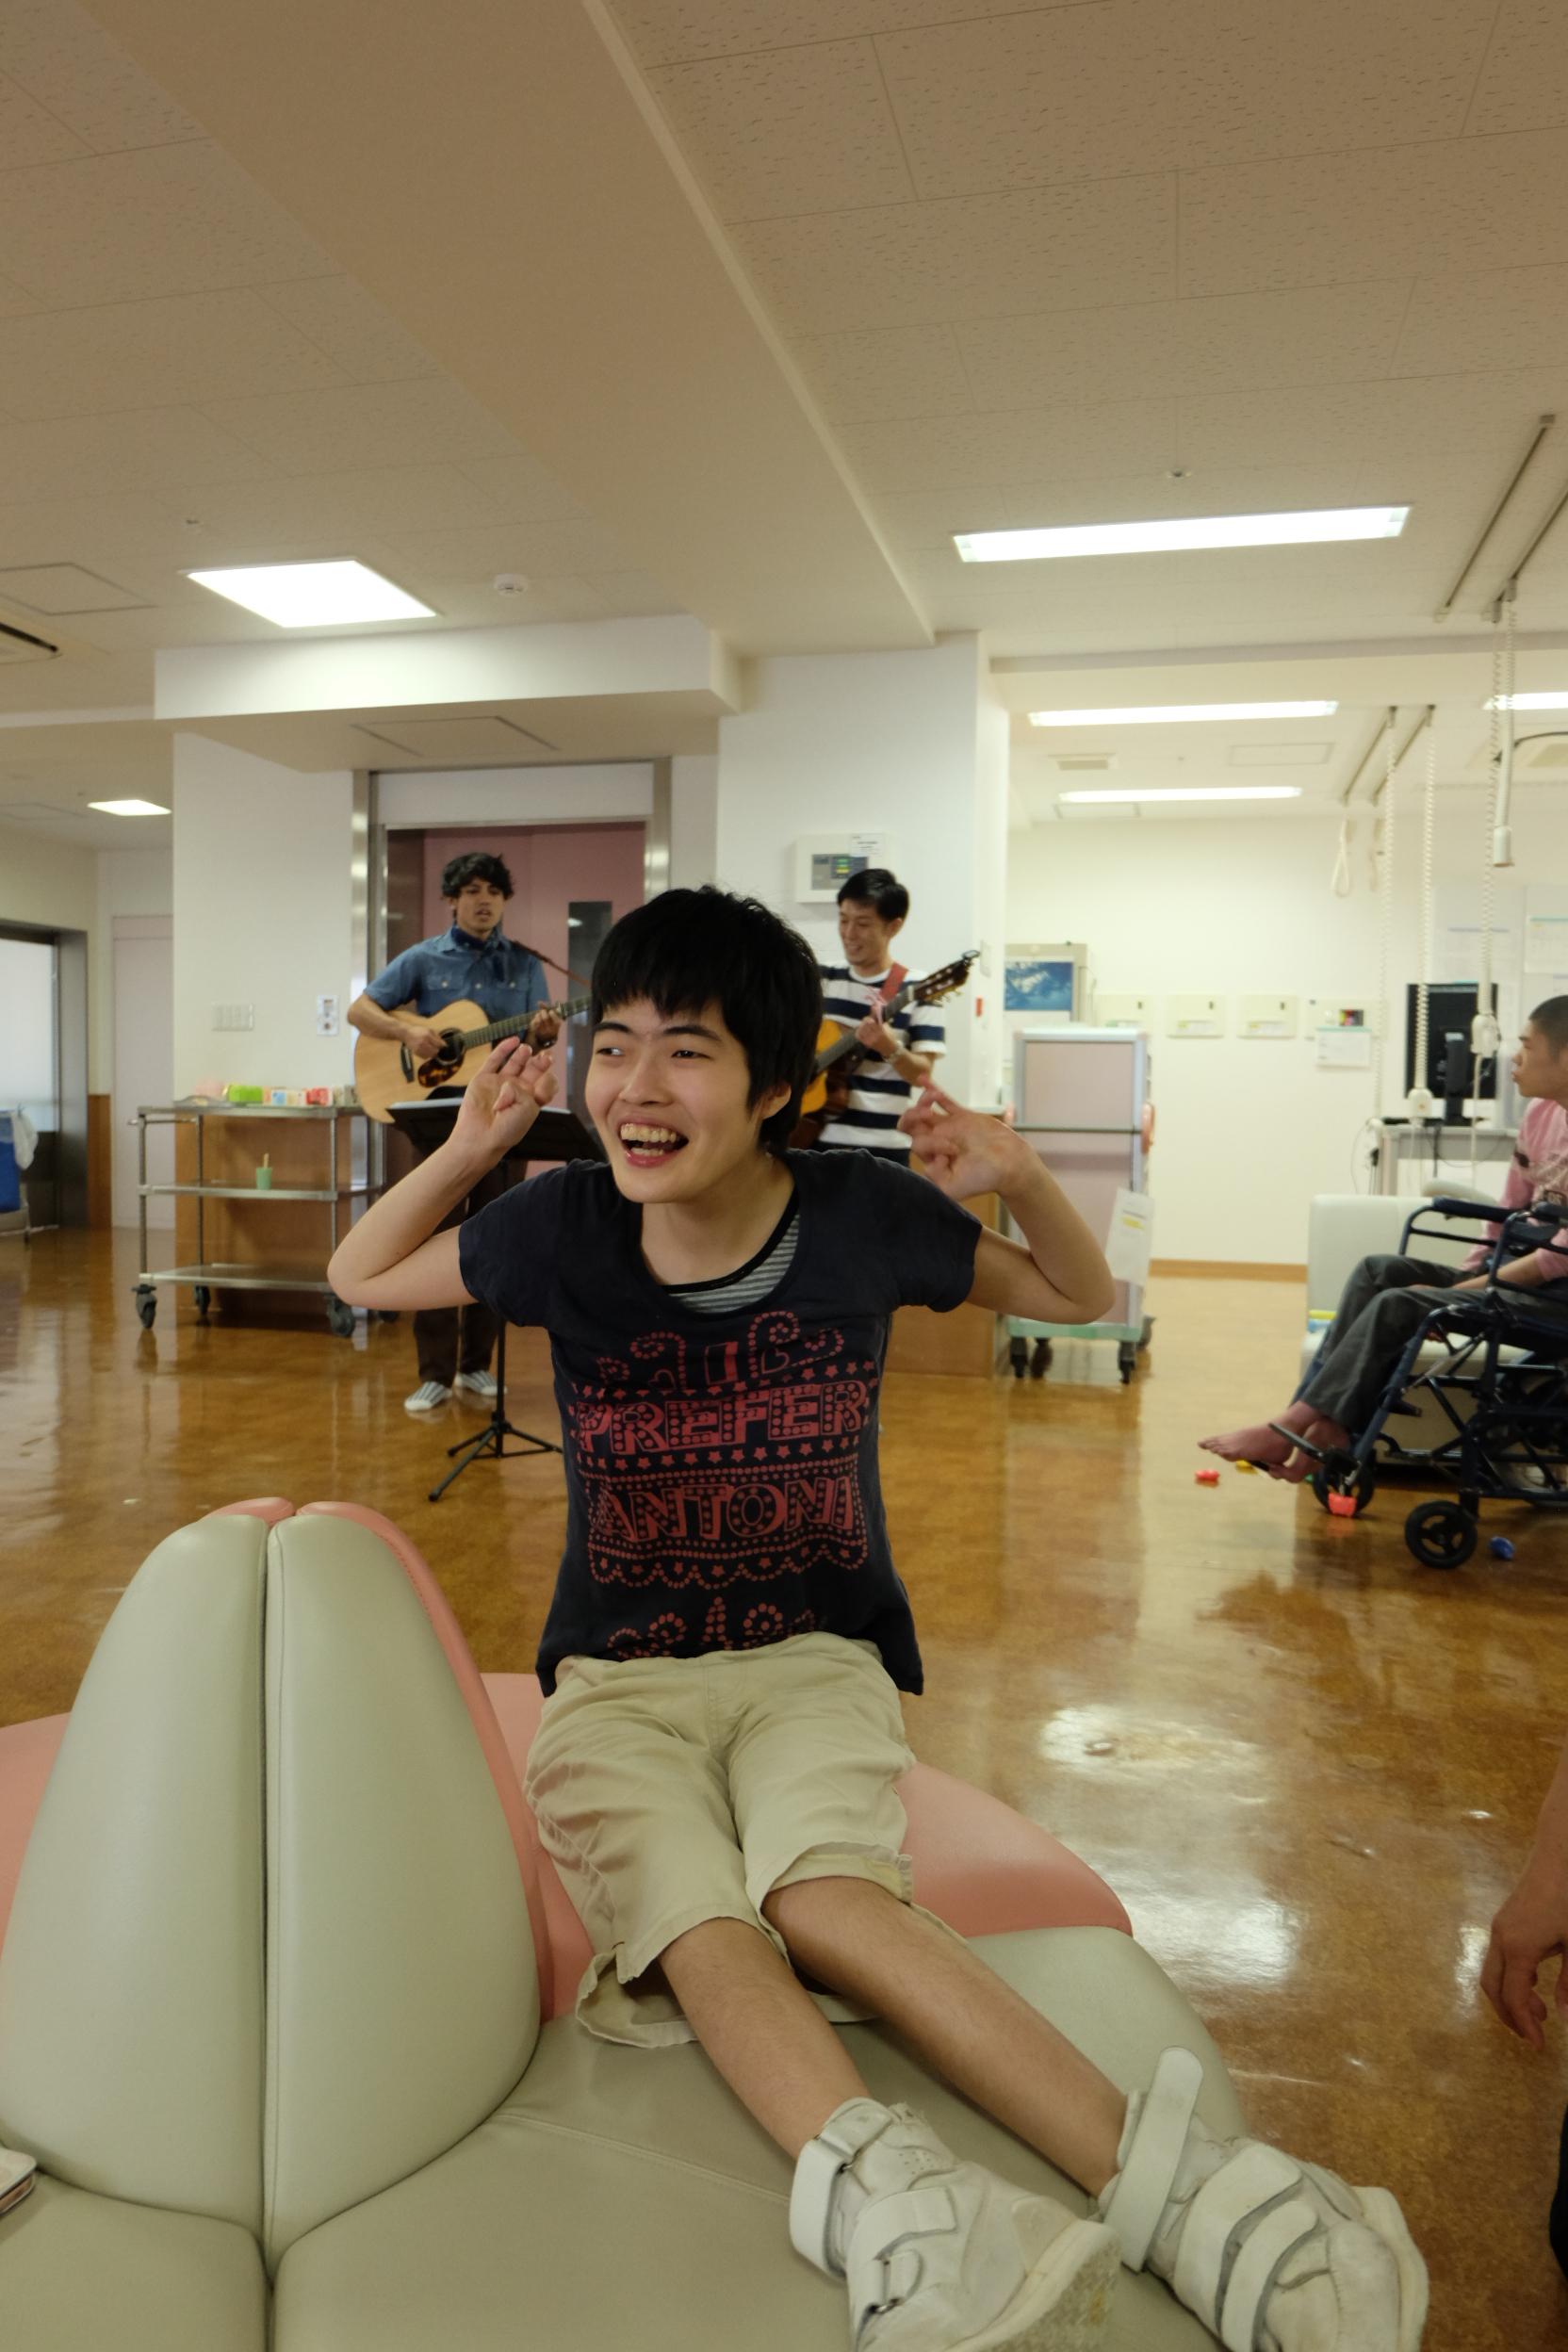 http://minato-yuu.or.jp/member/DSCF6645.JPG